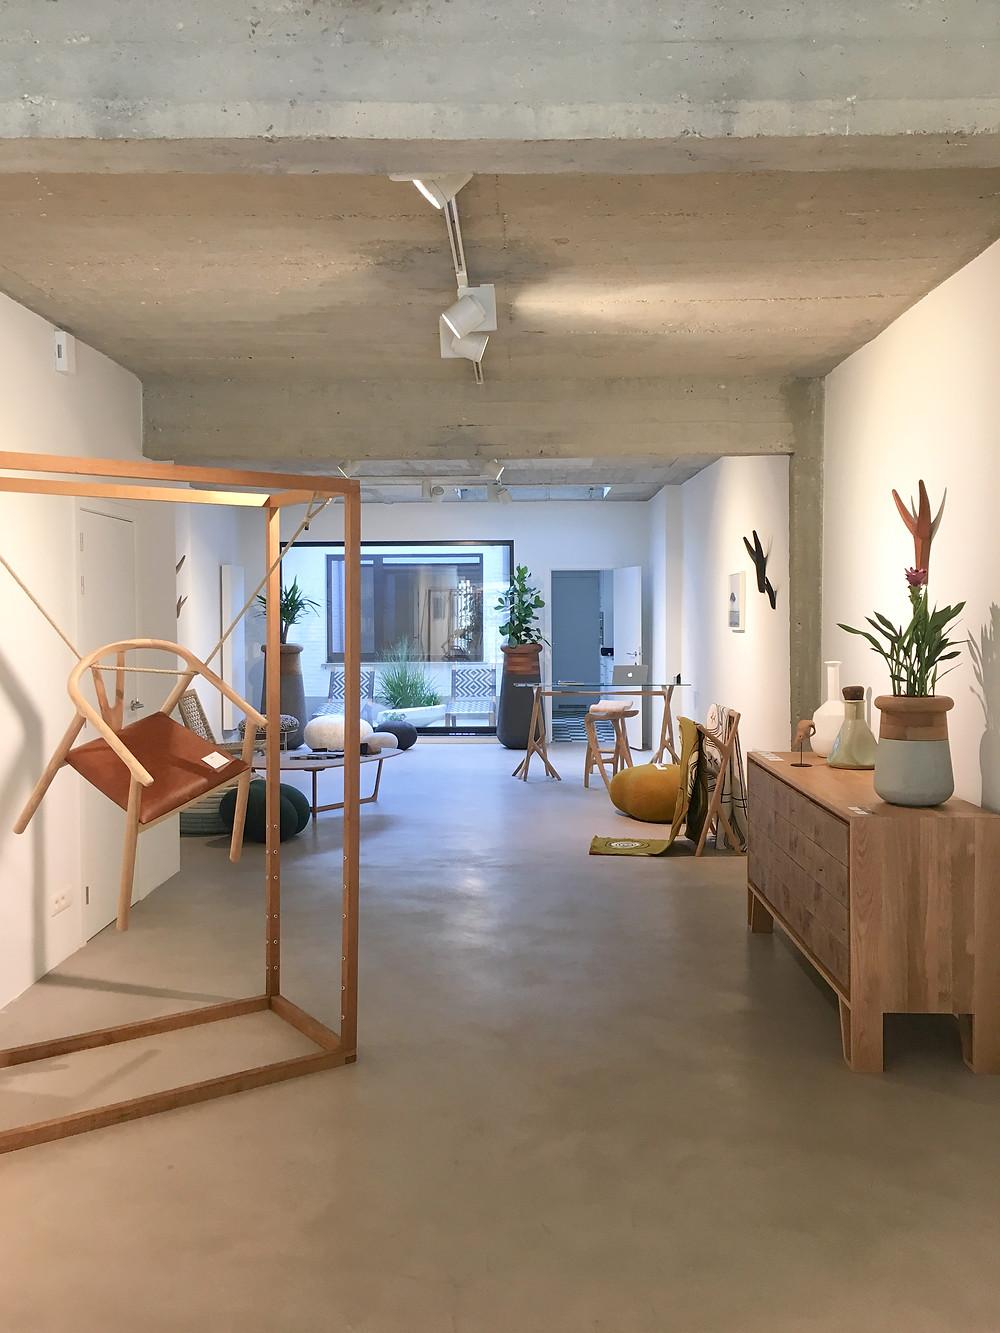 mimic, showcase, exhibition, antwerp, furniture, interior design, gallery, leopoldstraat, planters, decor, lighting, exhibition